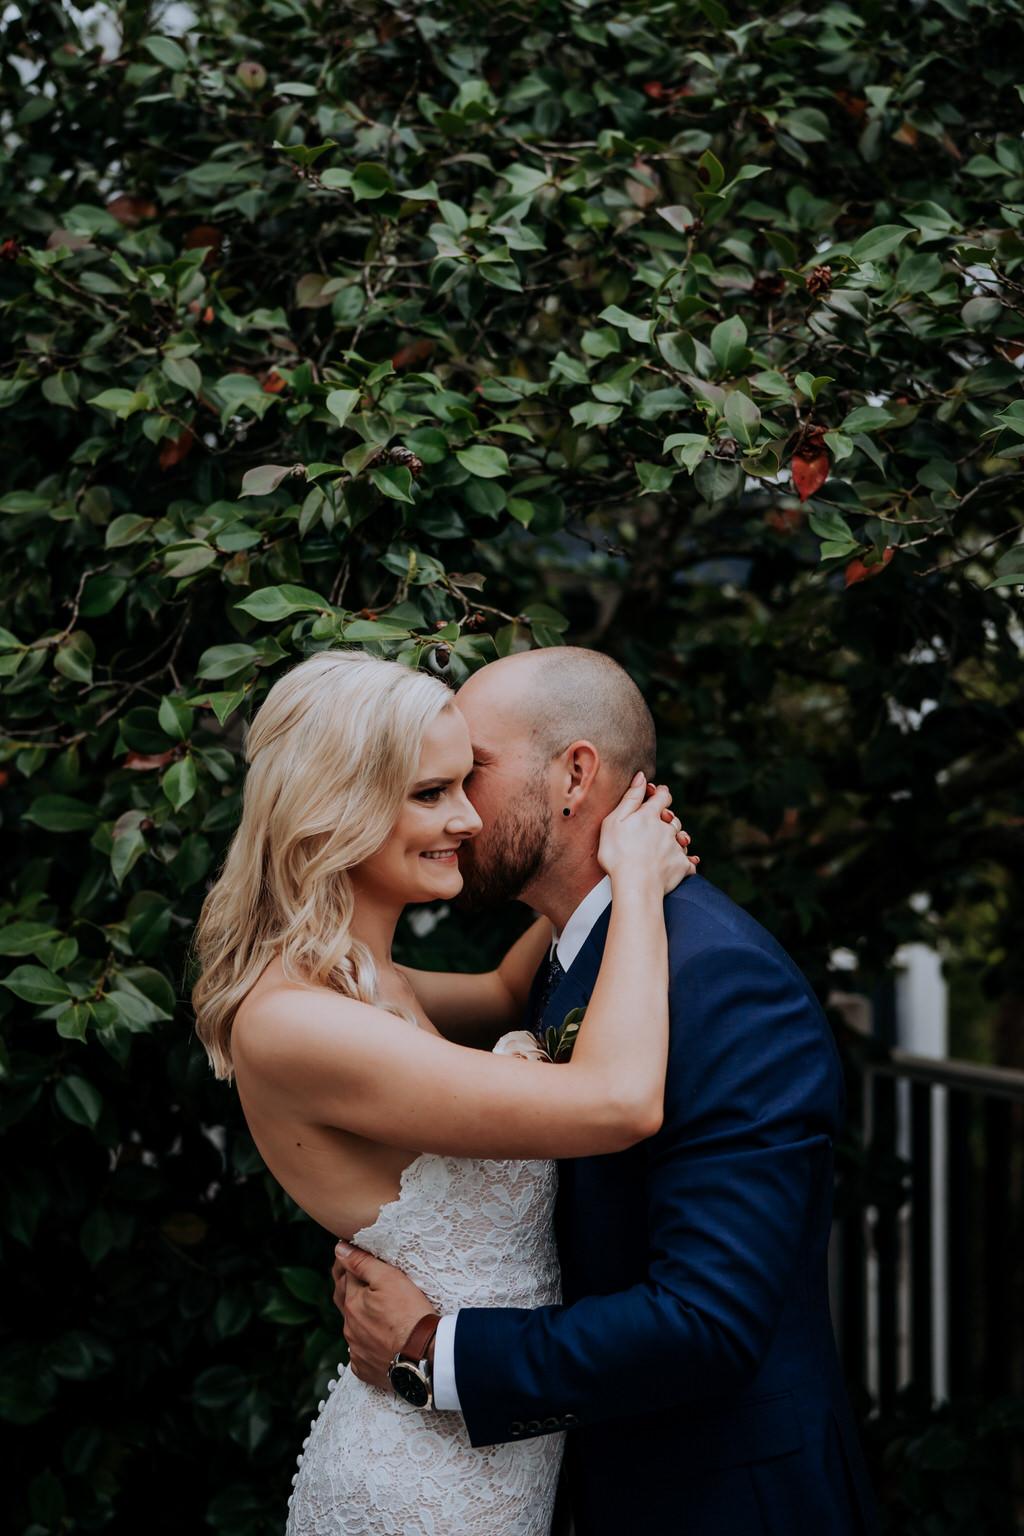 ava-me-photography-jade-simon-loxley-bellbird-hill-kurrajong-heights-wedding-728